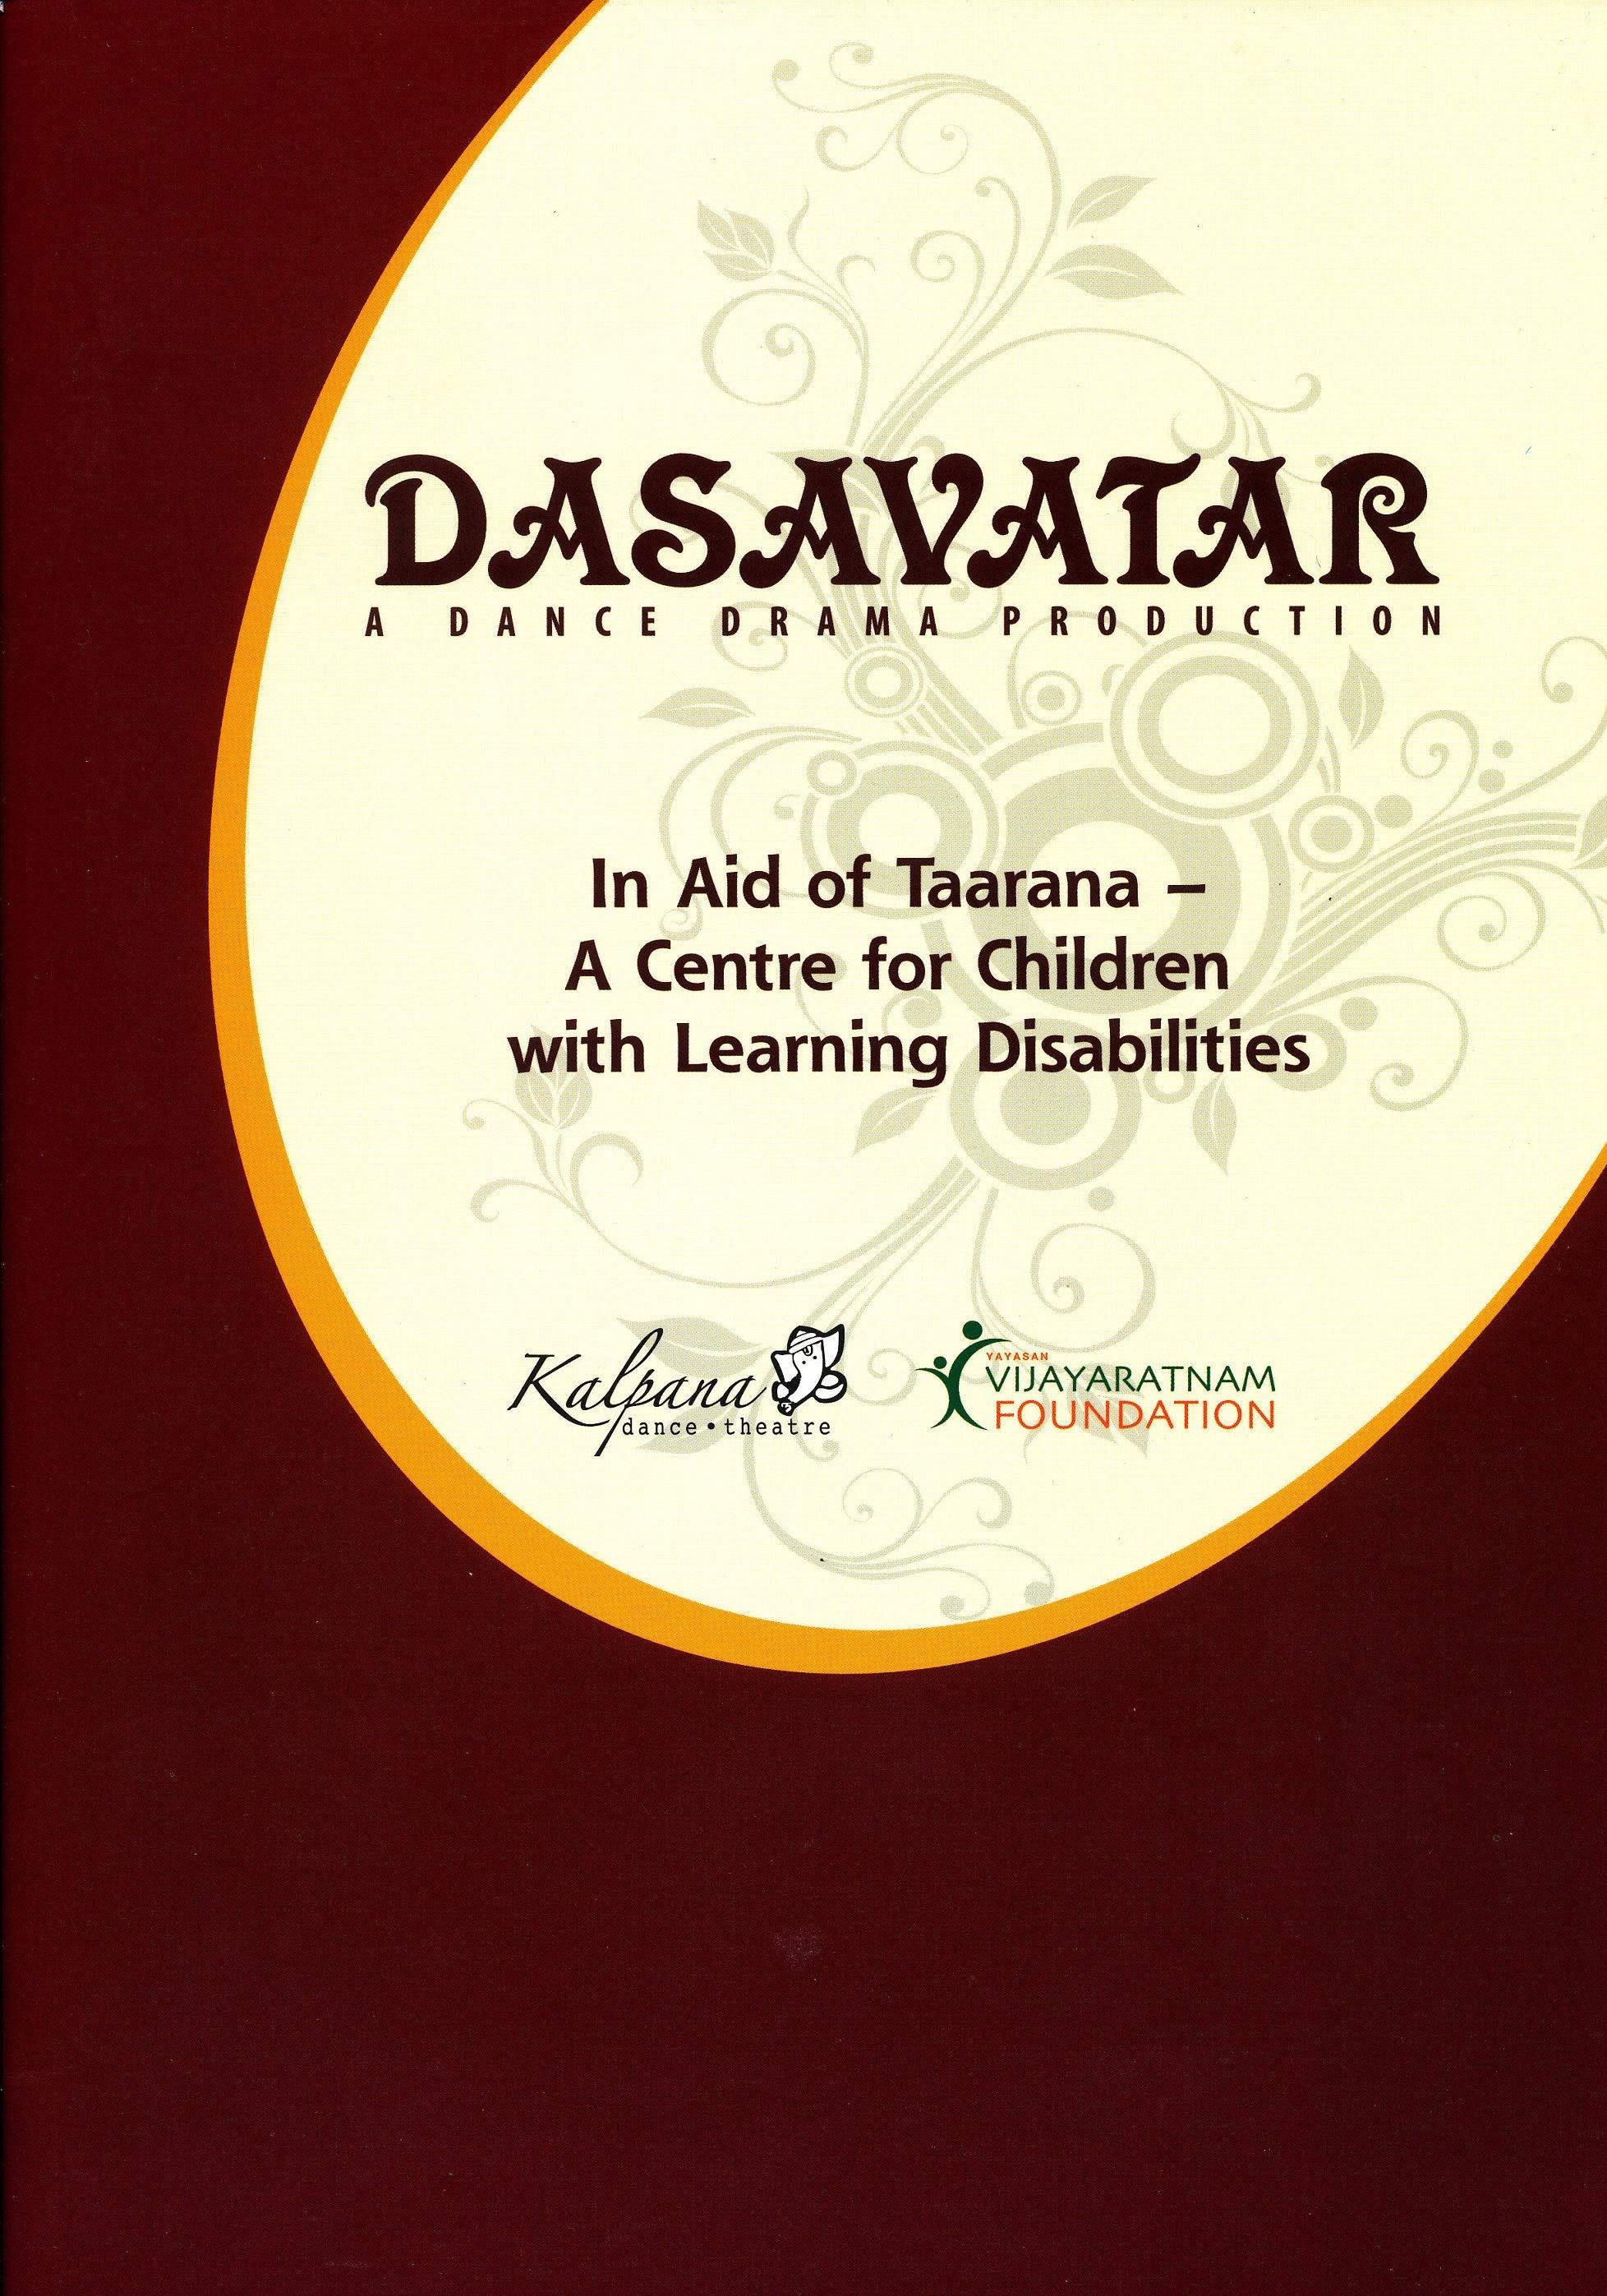 2011 Dasavatar Cover